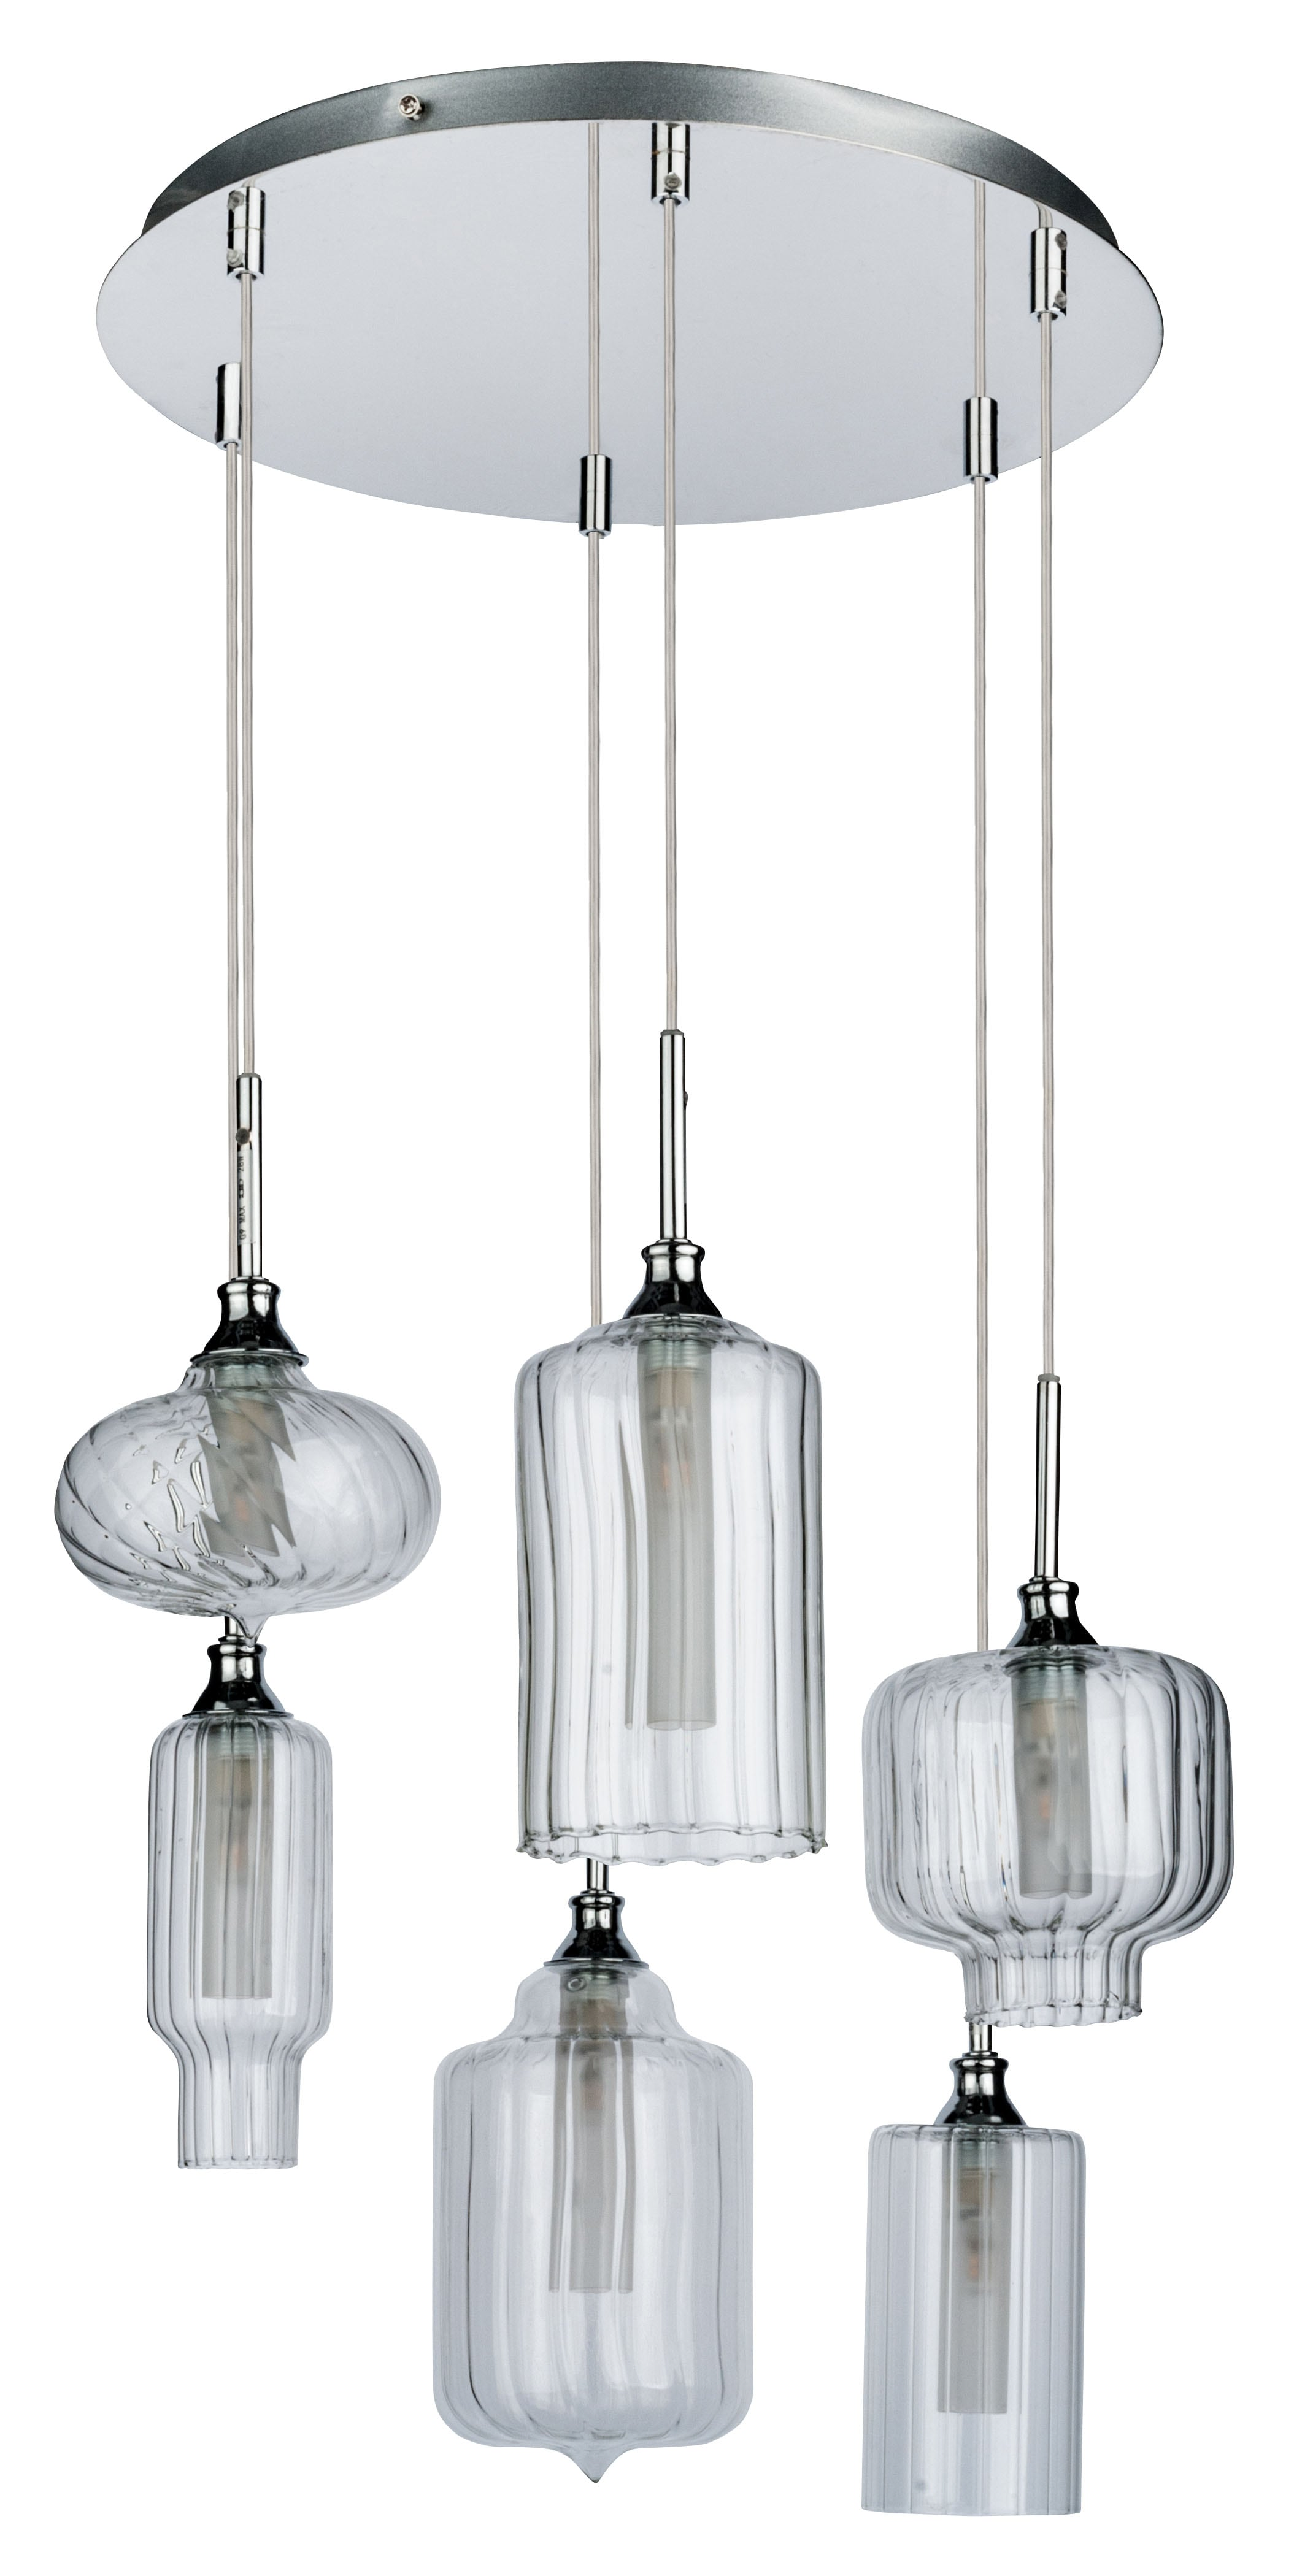 Six-point pendant lamp Larissa chrome / transparent G9 28W